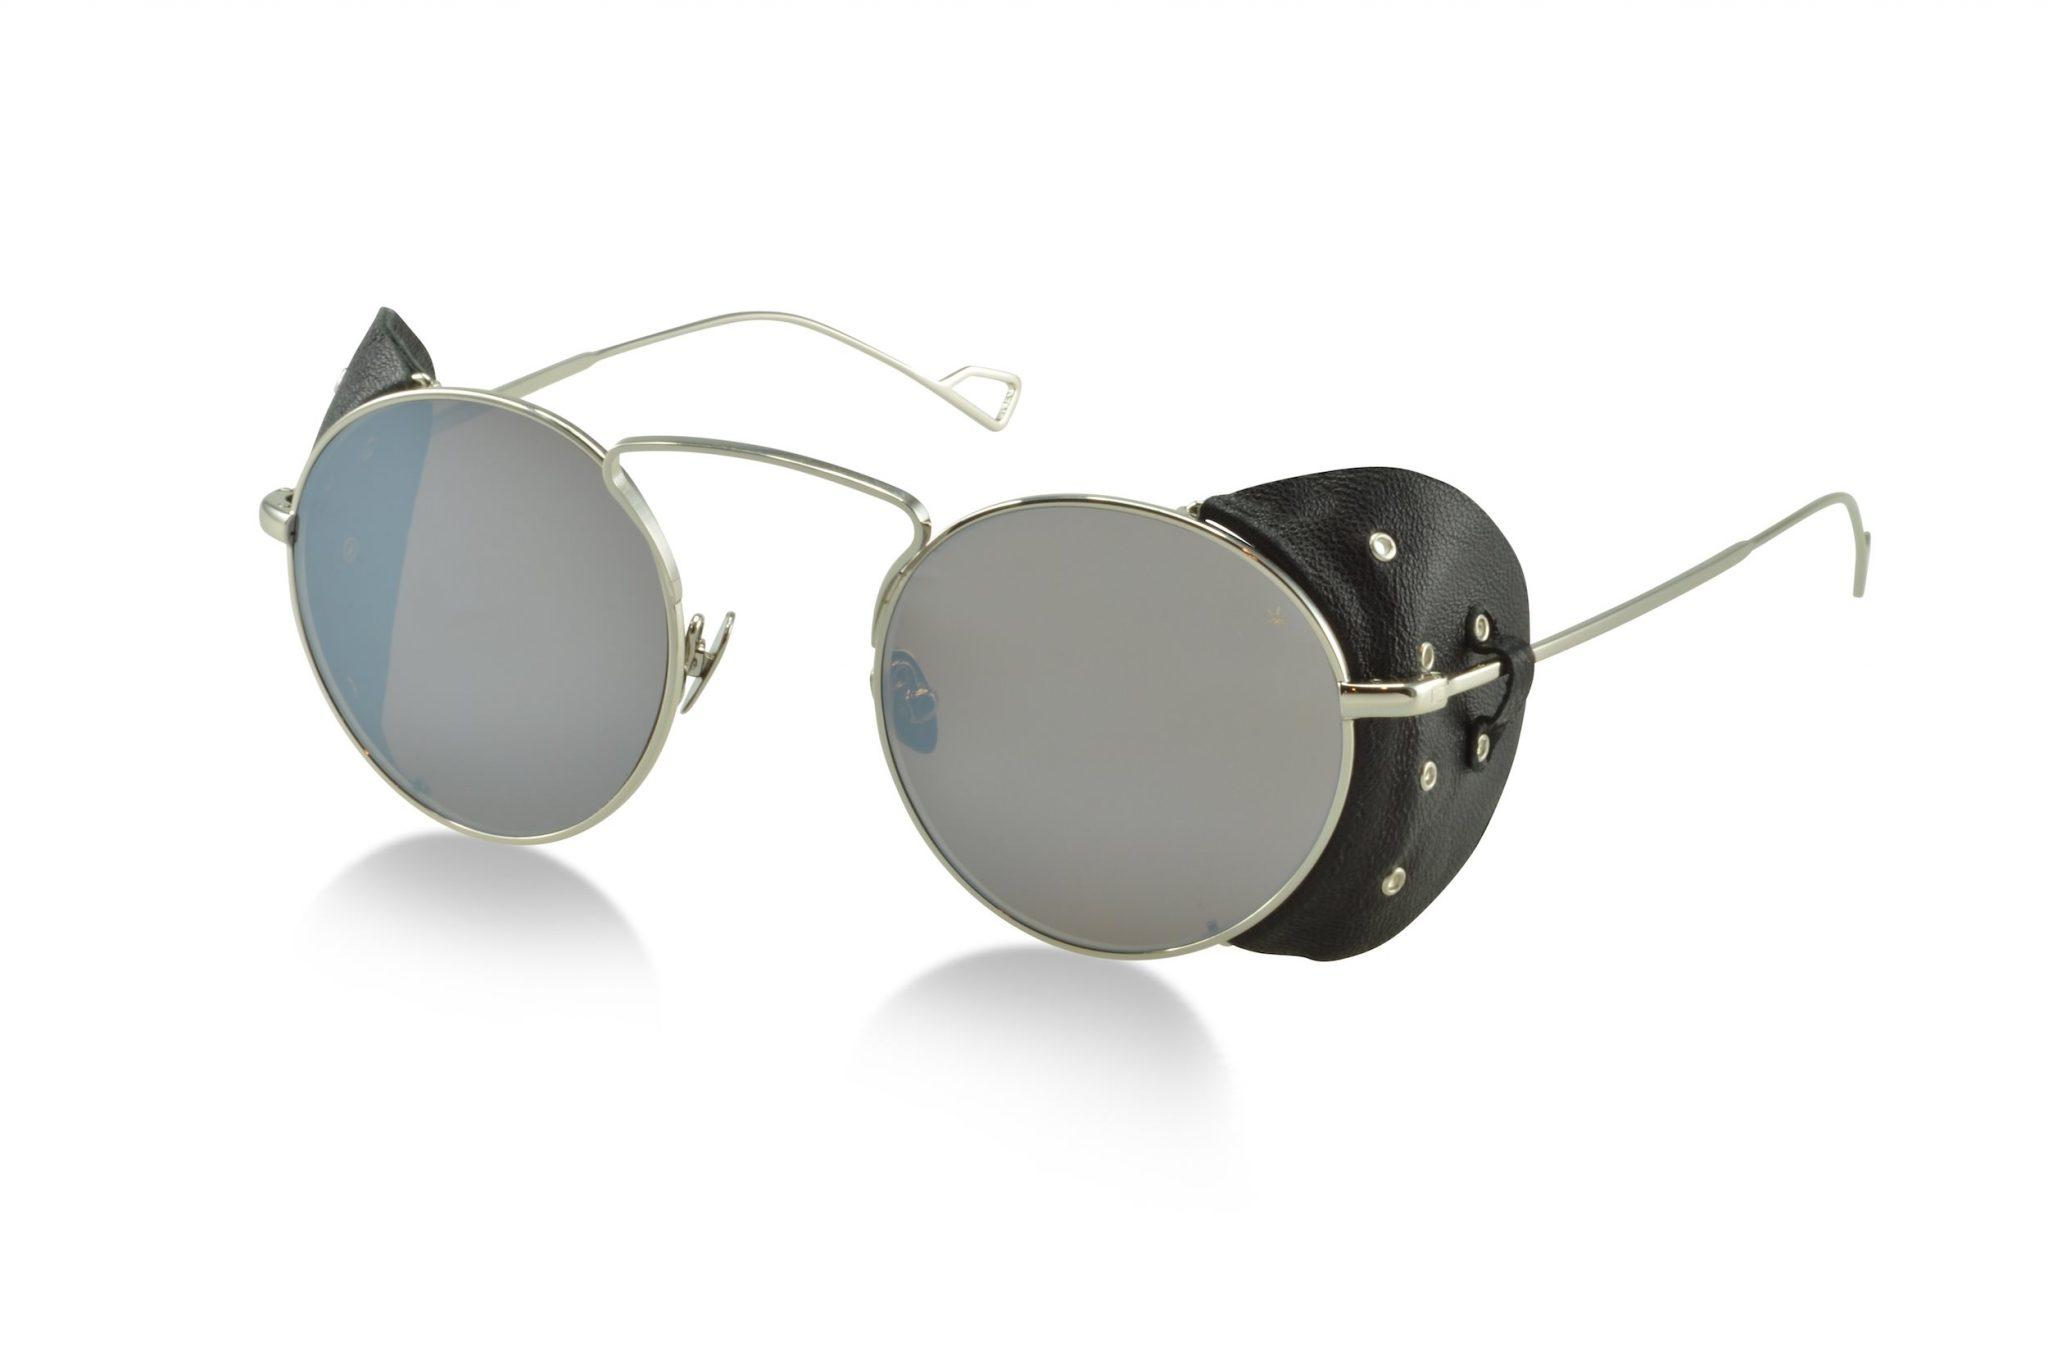 Northern Lights Optic NL 18 Sunglasses 2 - Northern Lights Optic Alpine Noir Sunglasses